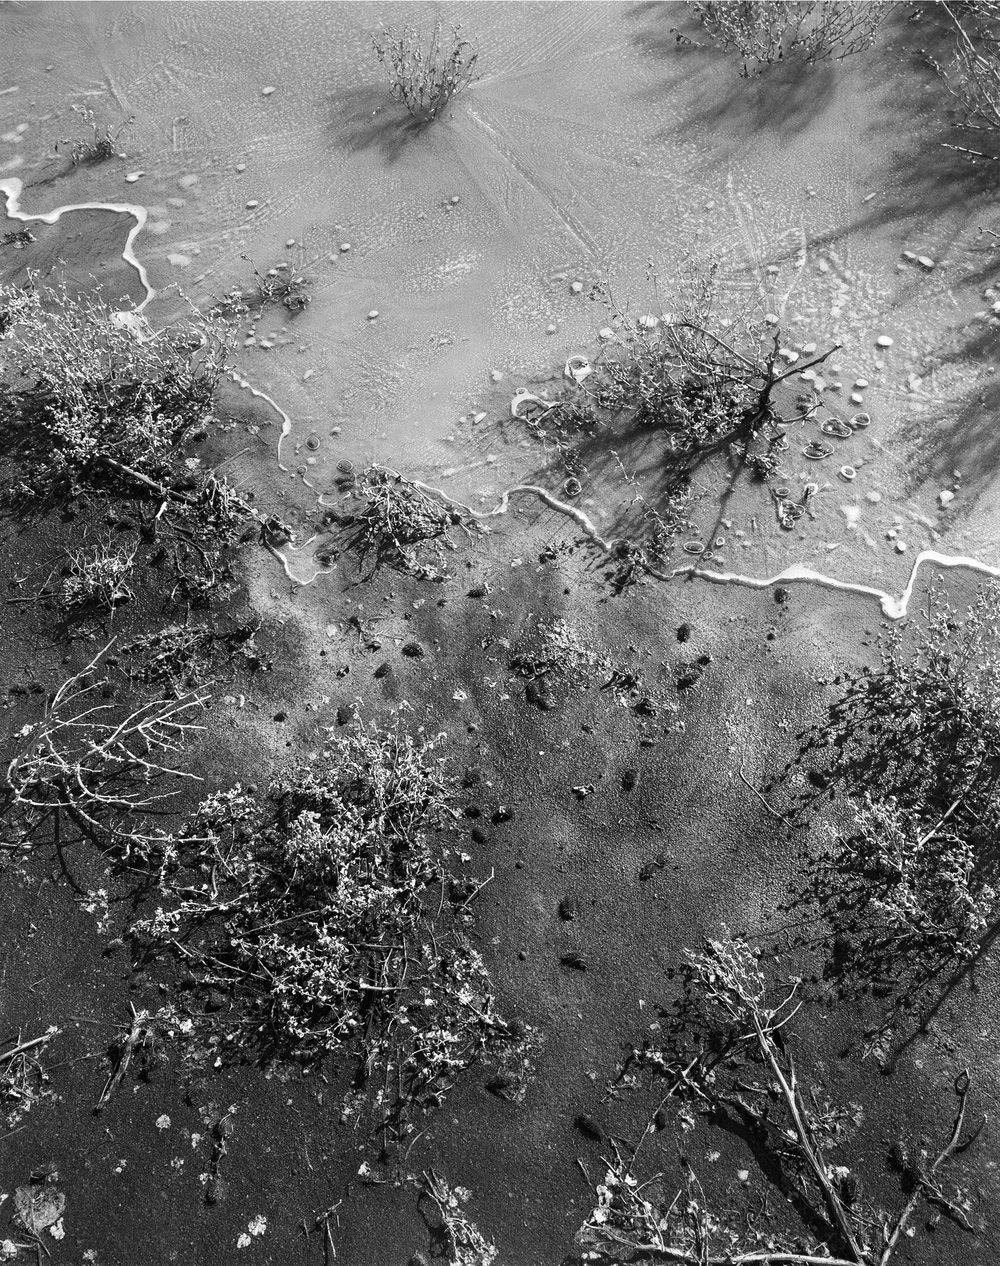 frozen-waters-edge.jpg